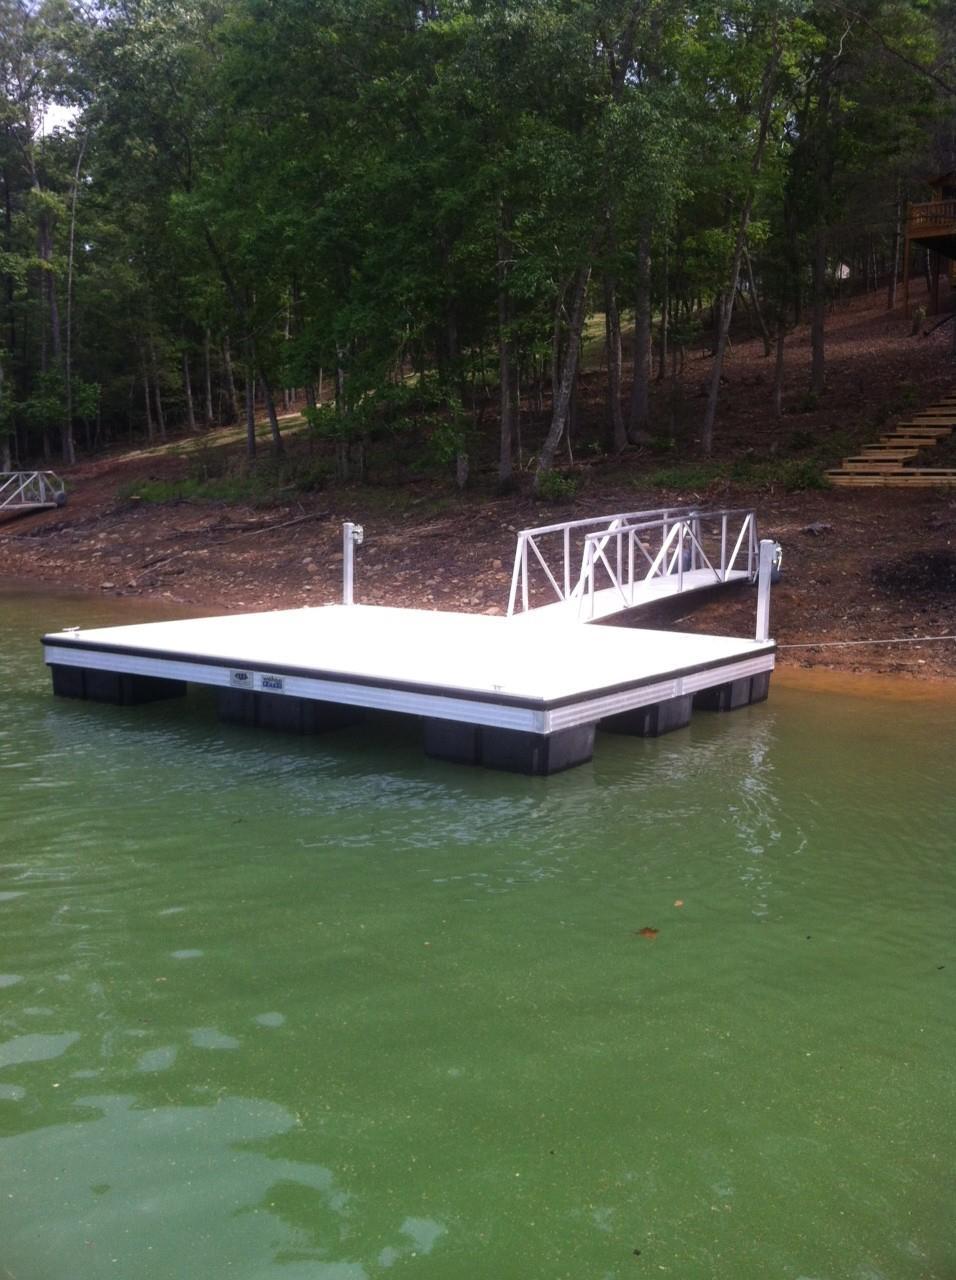 Floating swim docks bing images for Small pond dock plans